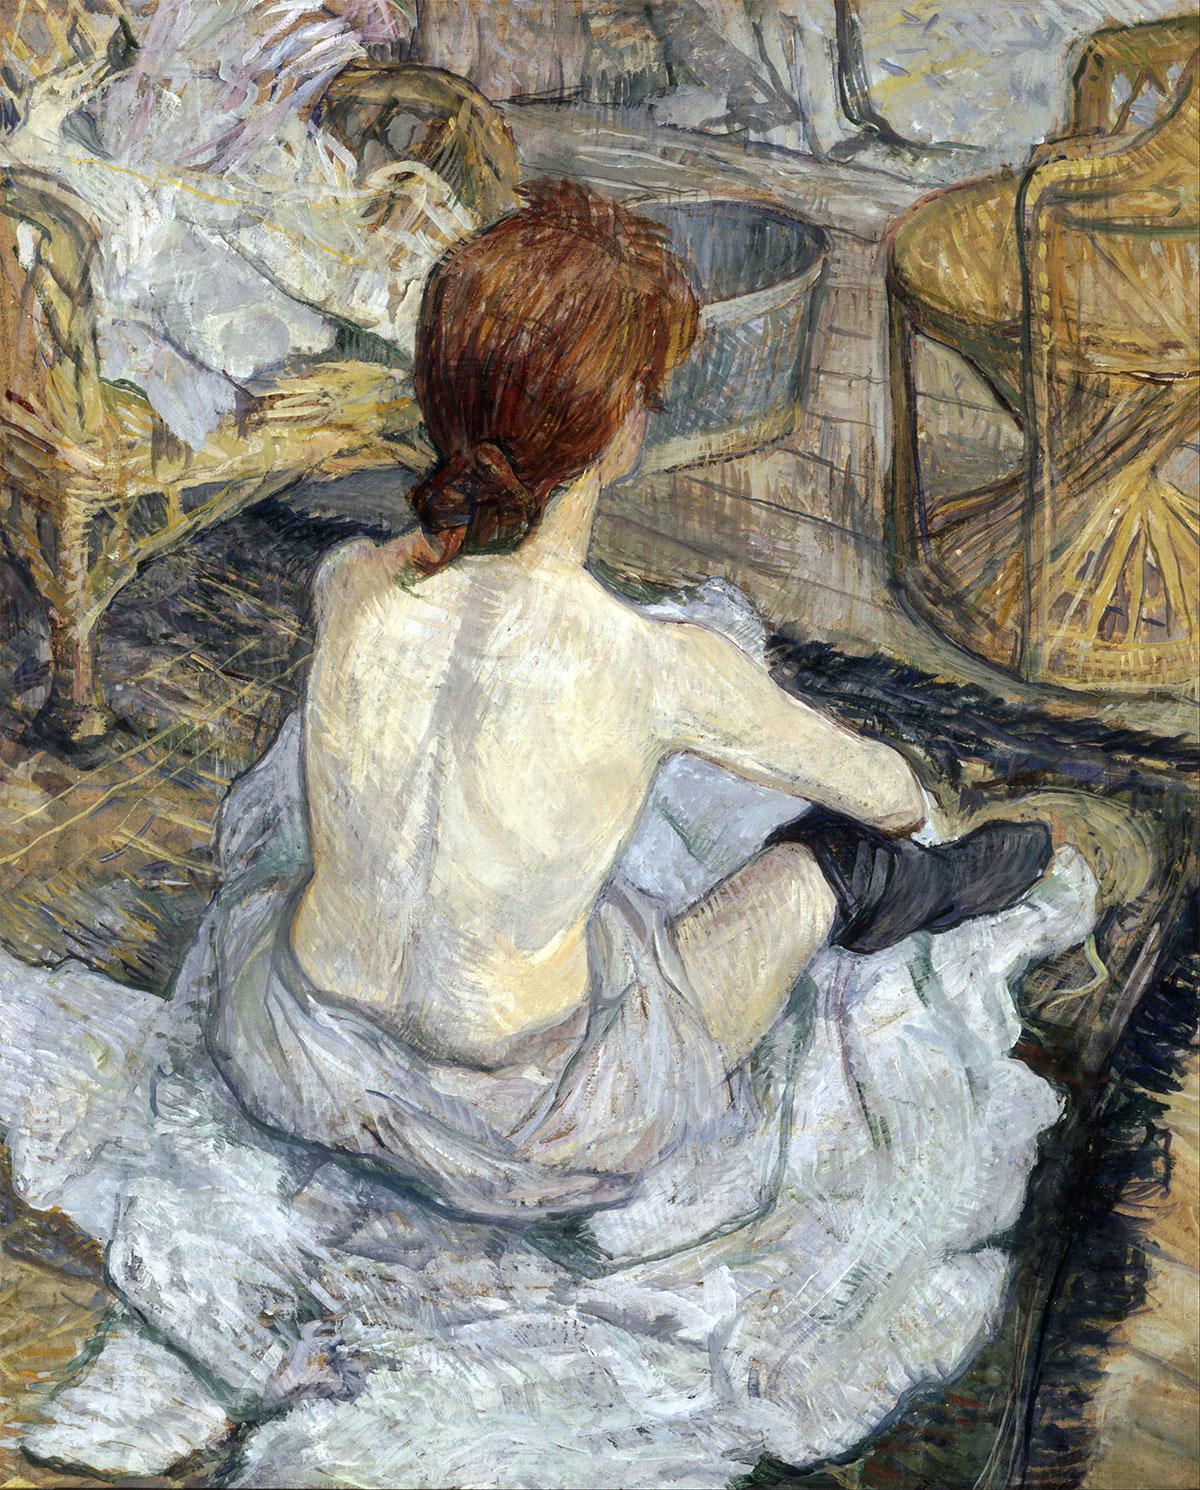 Rousse dit aussi La Toilette (Rossa detta anche La Toilette), quadro celebre di Henri Toulouse-Lautrec